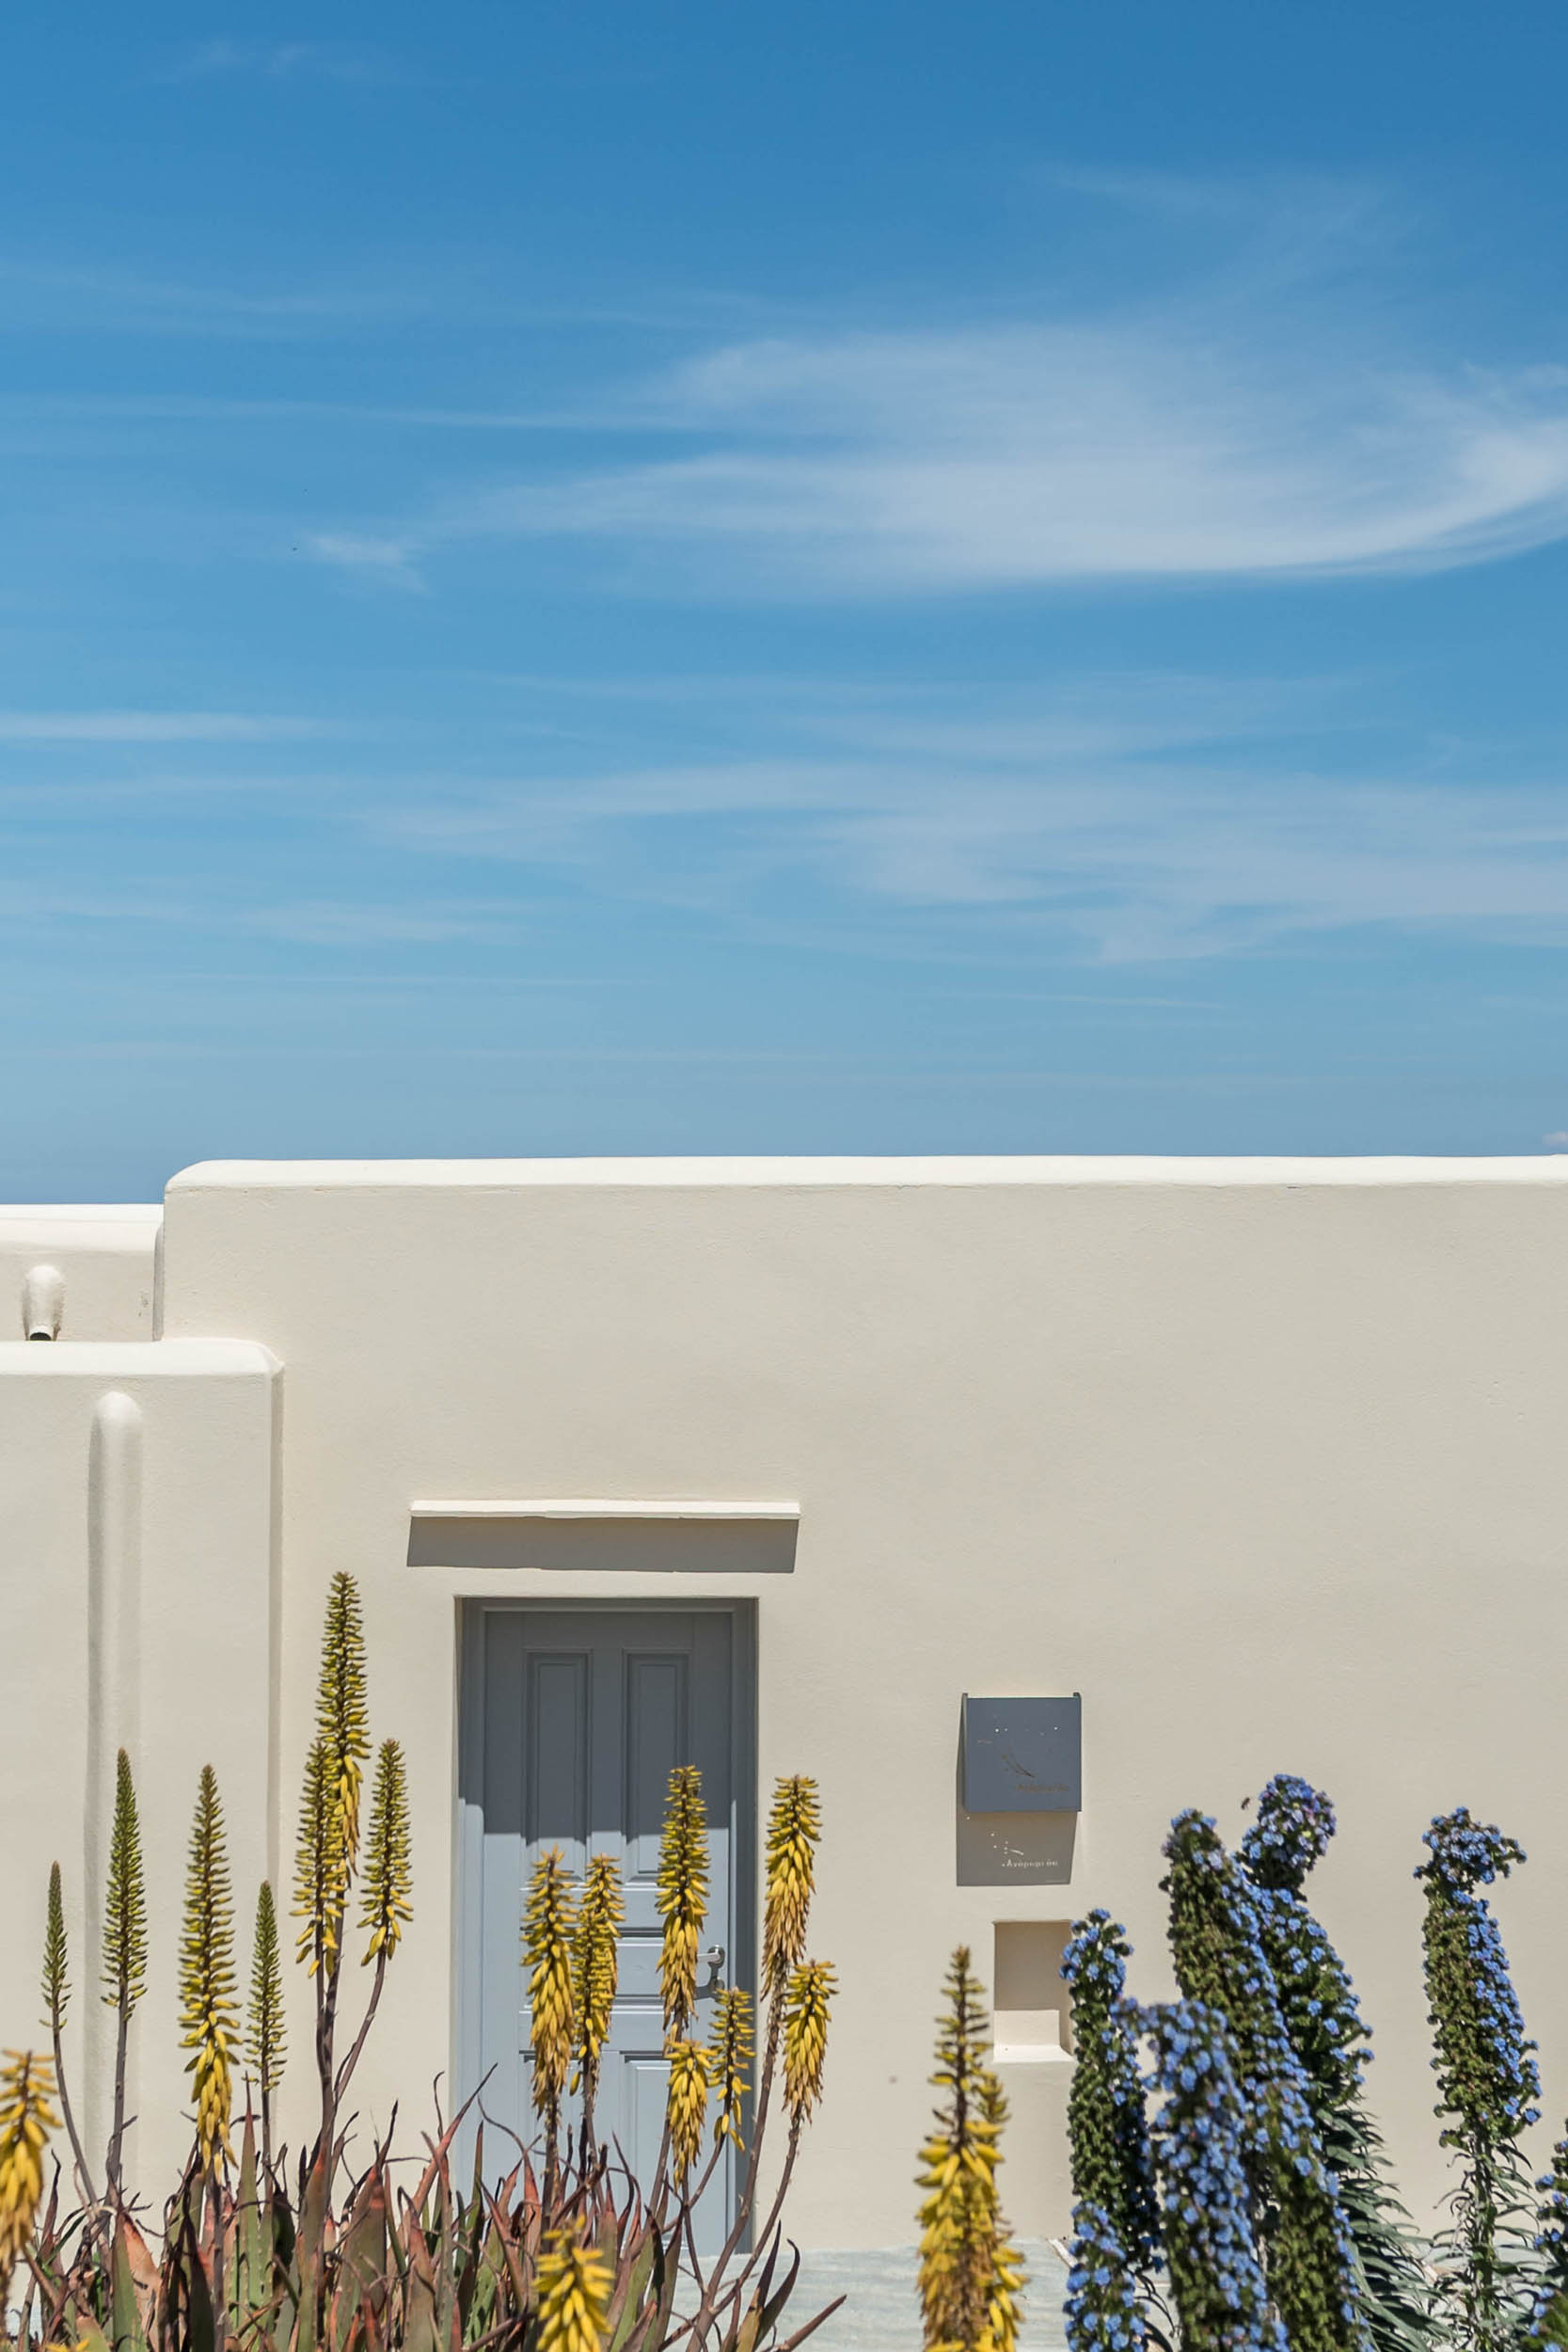 Kassias Landscape Architecture and Design